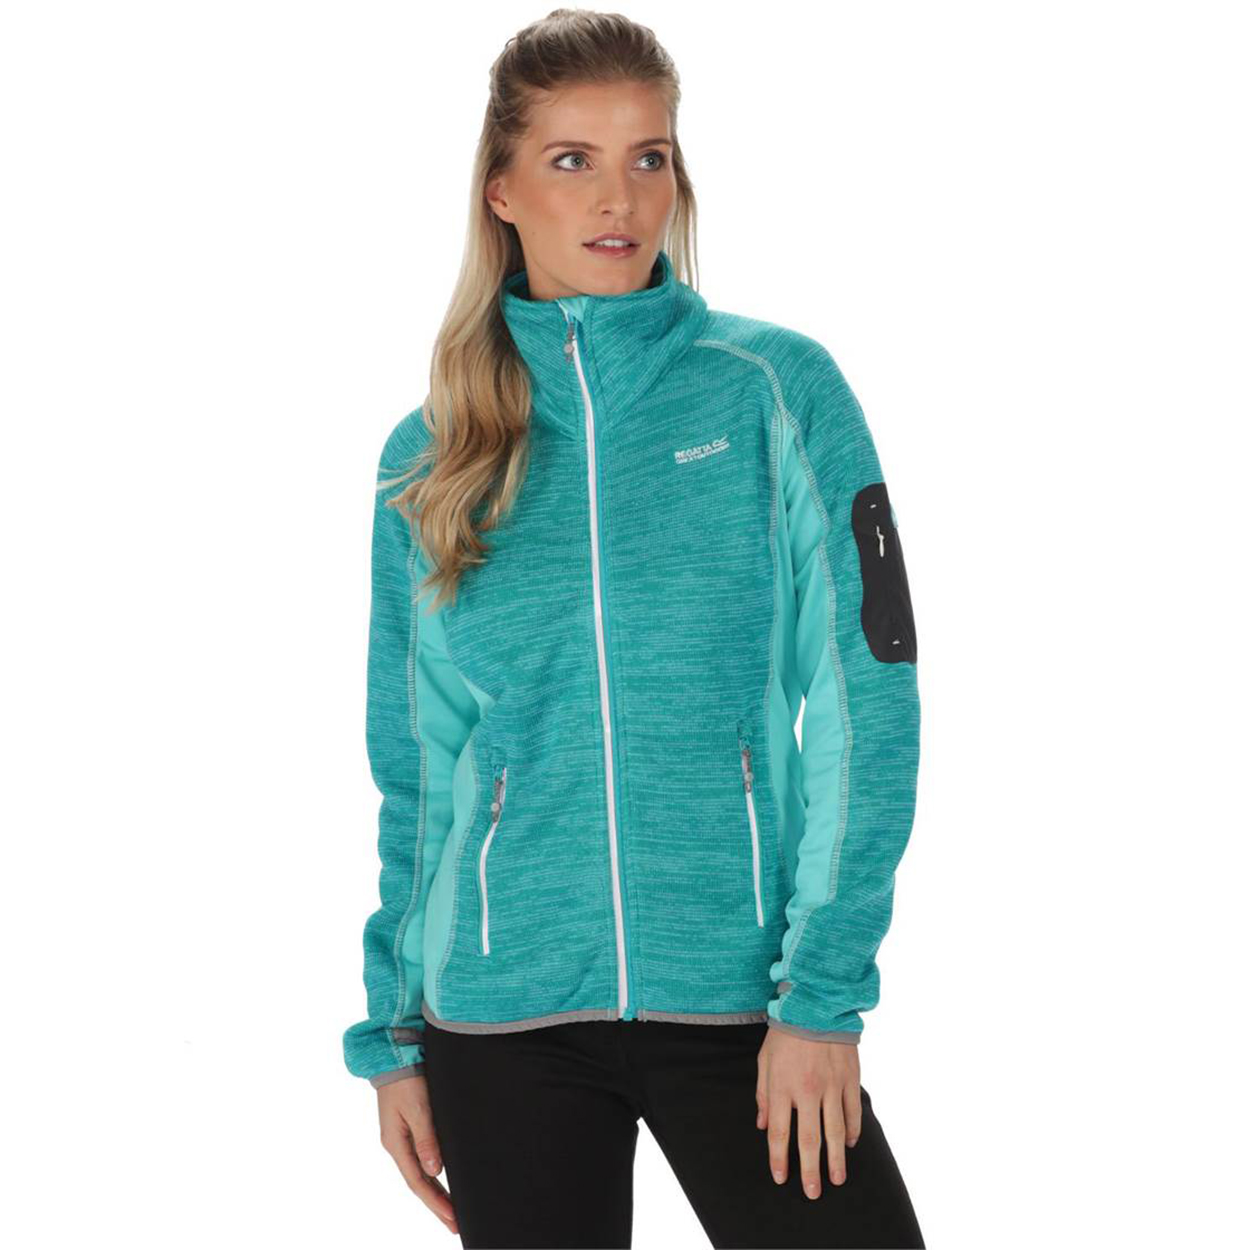 Regatta Great Outdoors Womens/Ladies Laney III Fleece Jacket (26) (Aqua/Horizon)